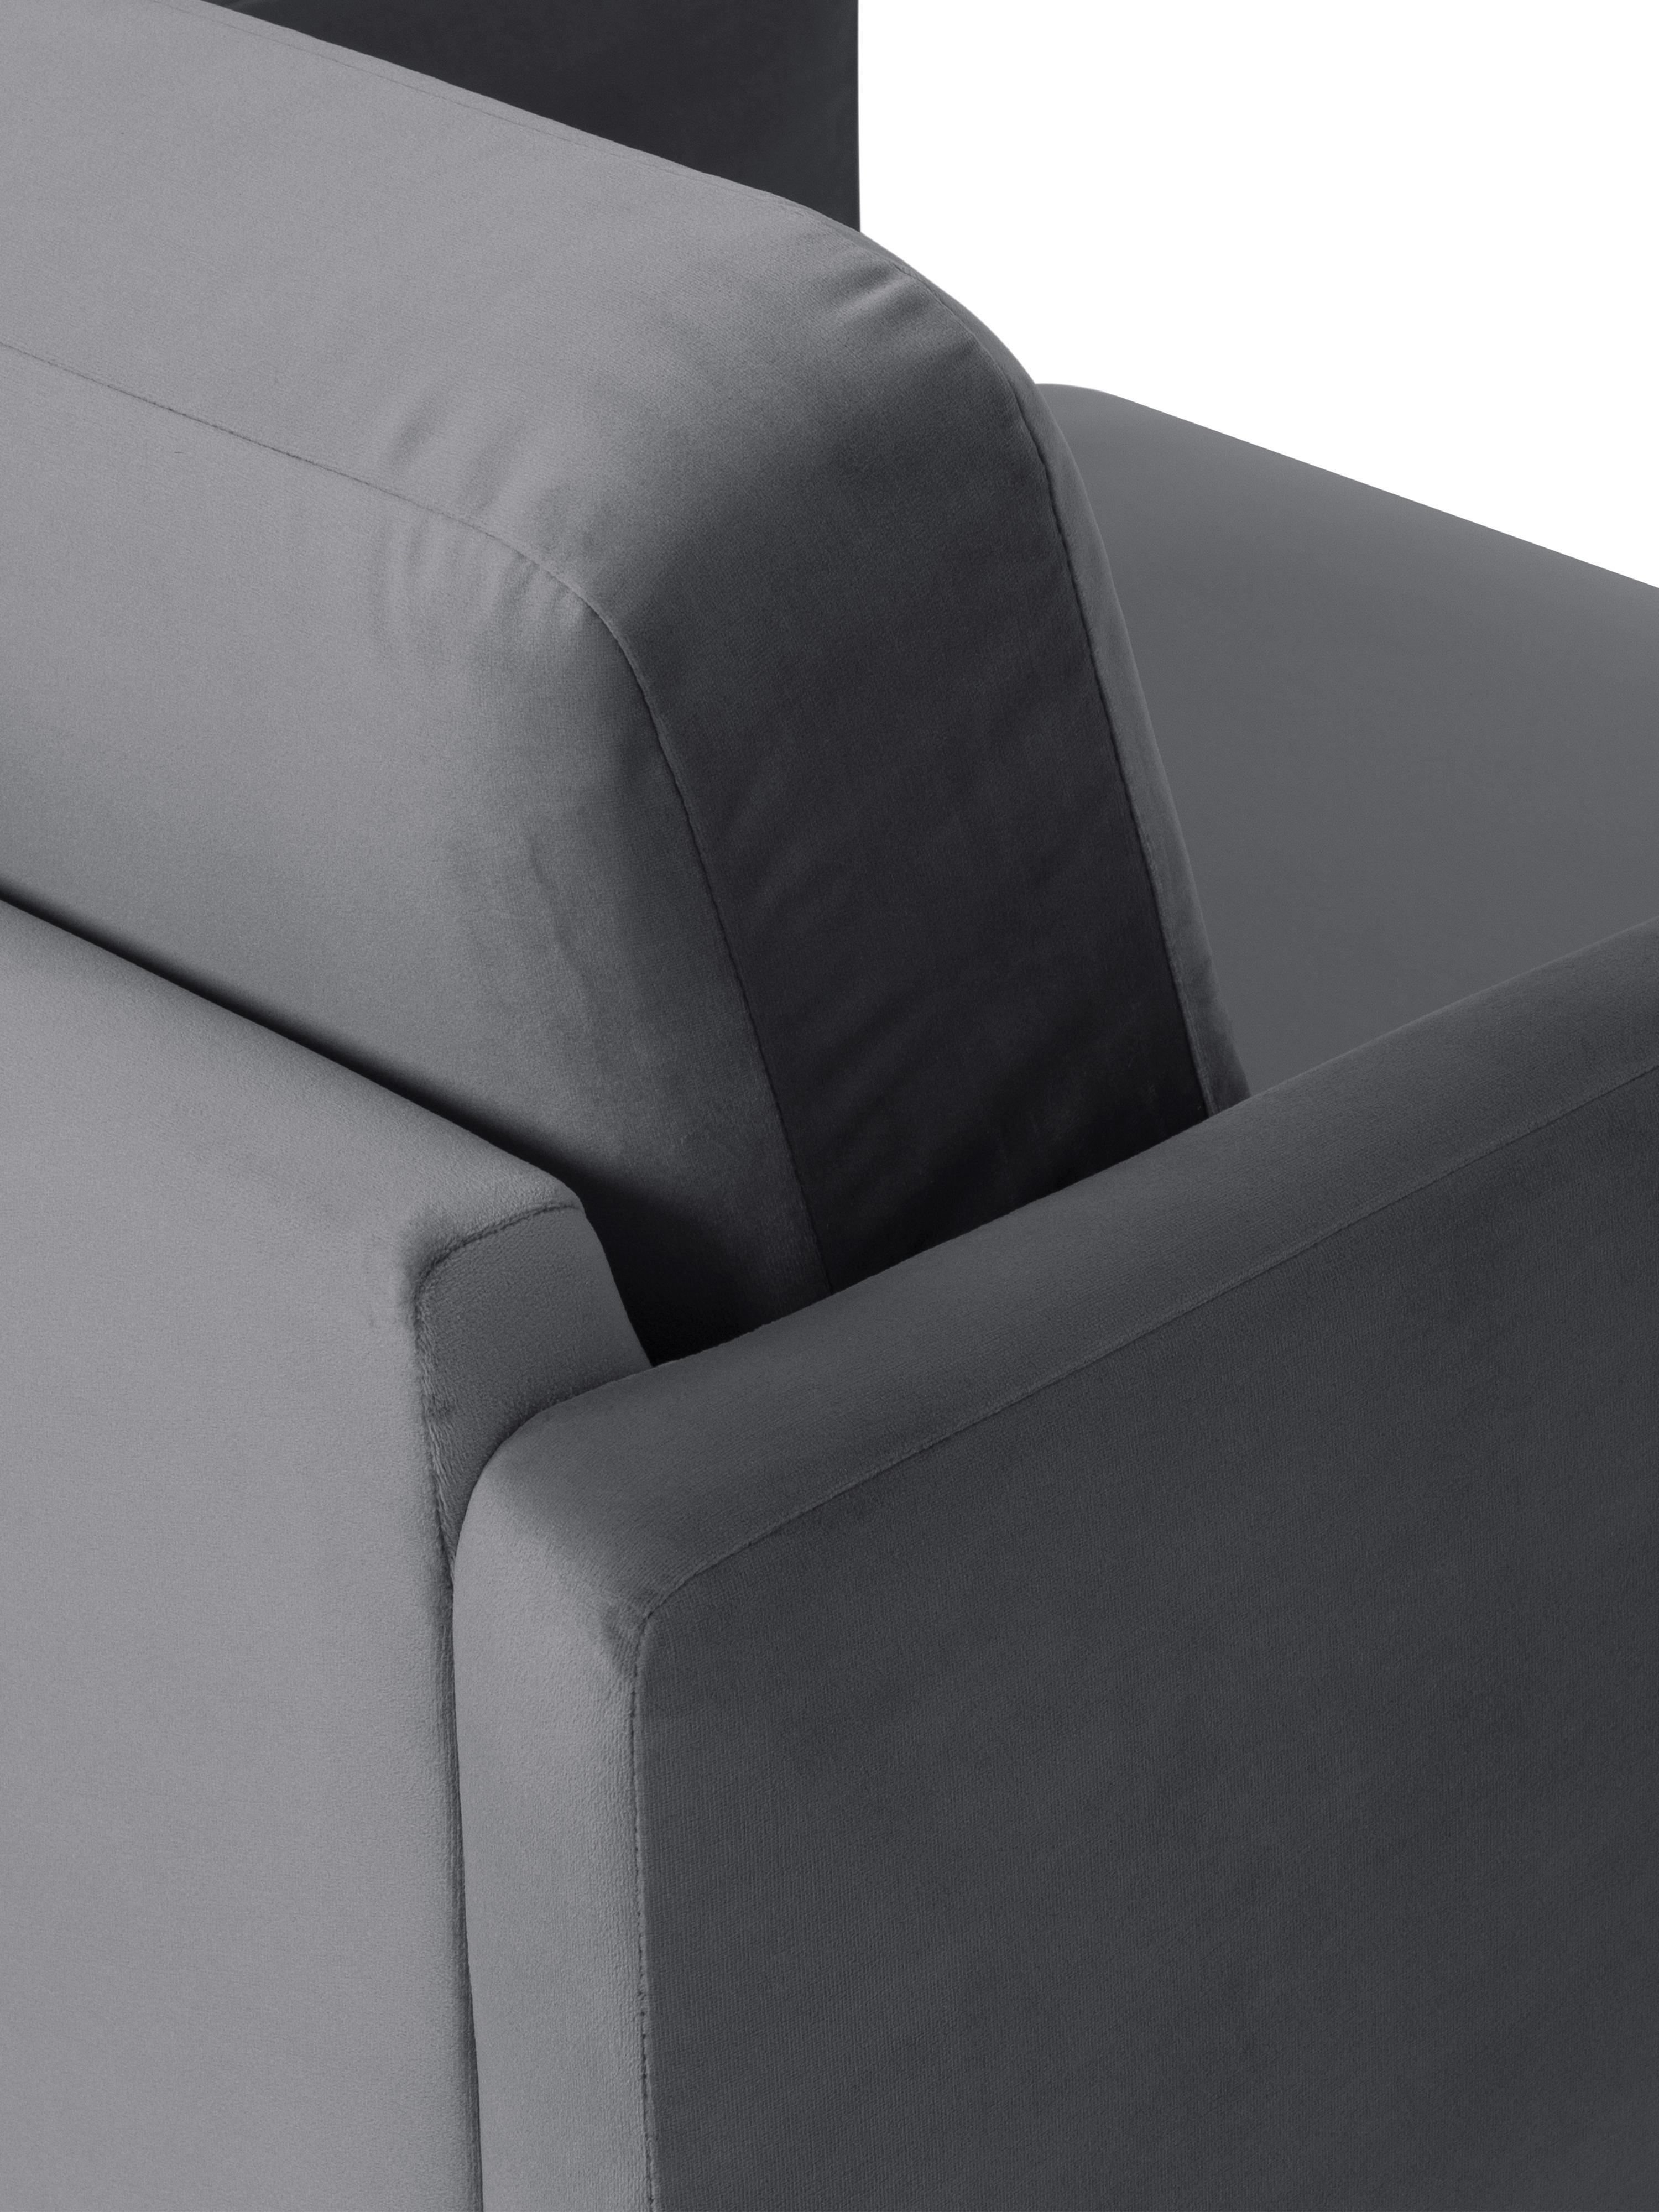 Samt-Sessel Fluente, Bezug: Samt (Hochwertiger Polyes, Gestell: Massives Kiefernholz, Füße: Metall, pulverbeschichtet, Samt Braungrau, B 74 x T 85 cm